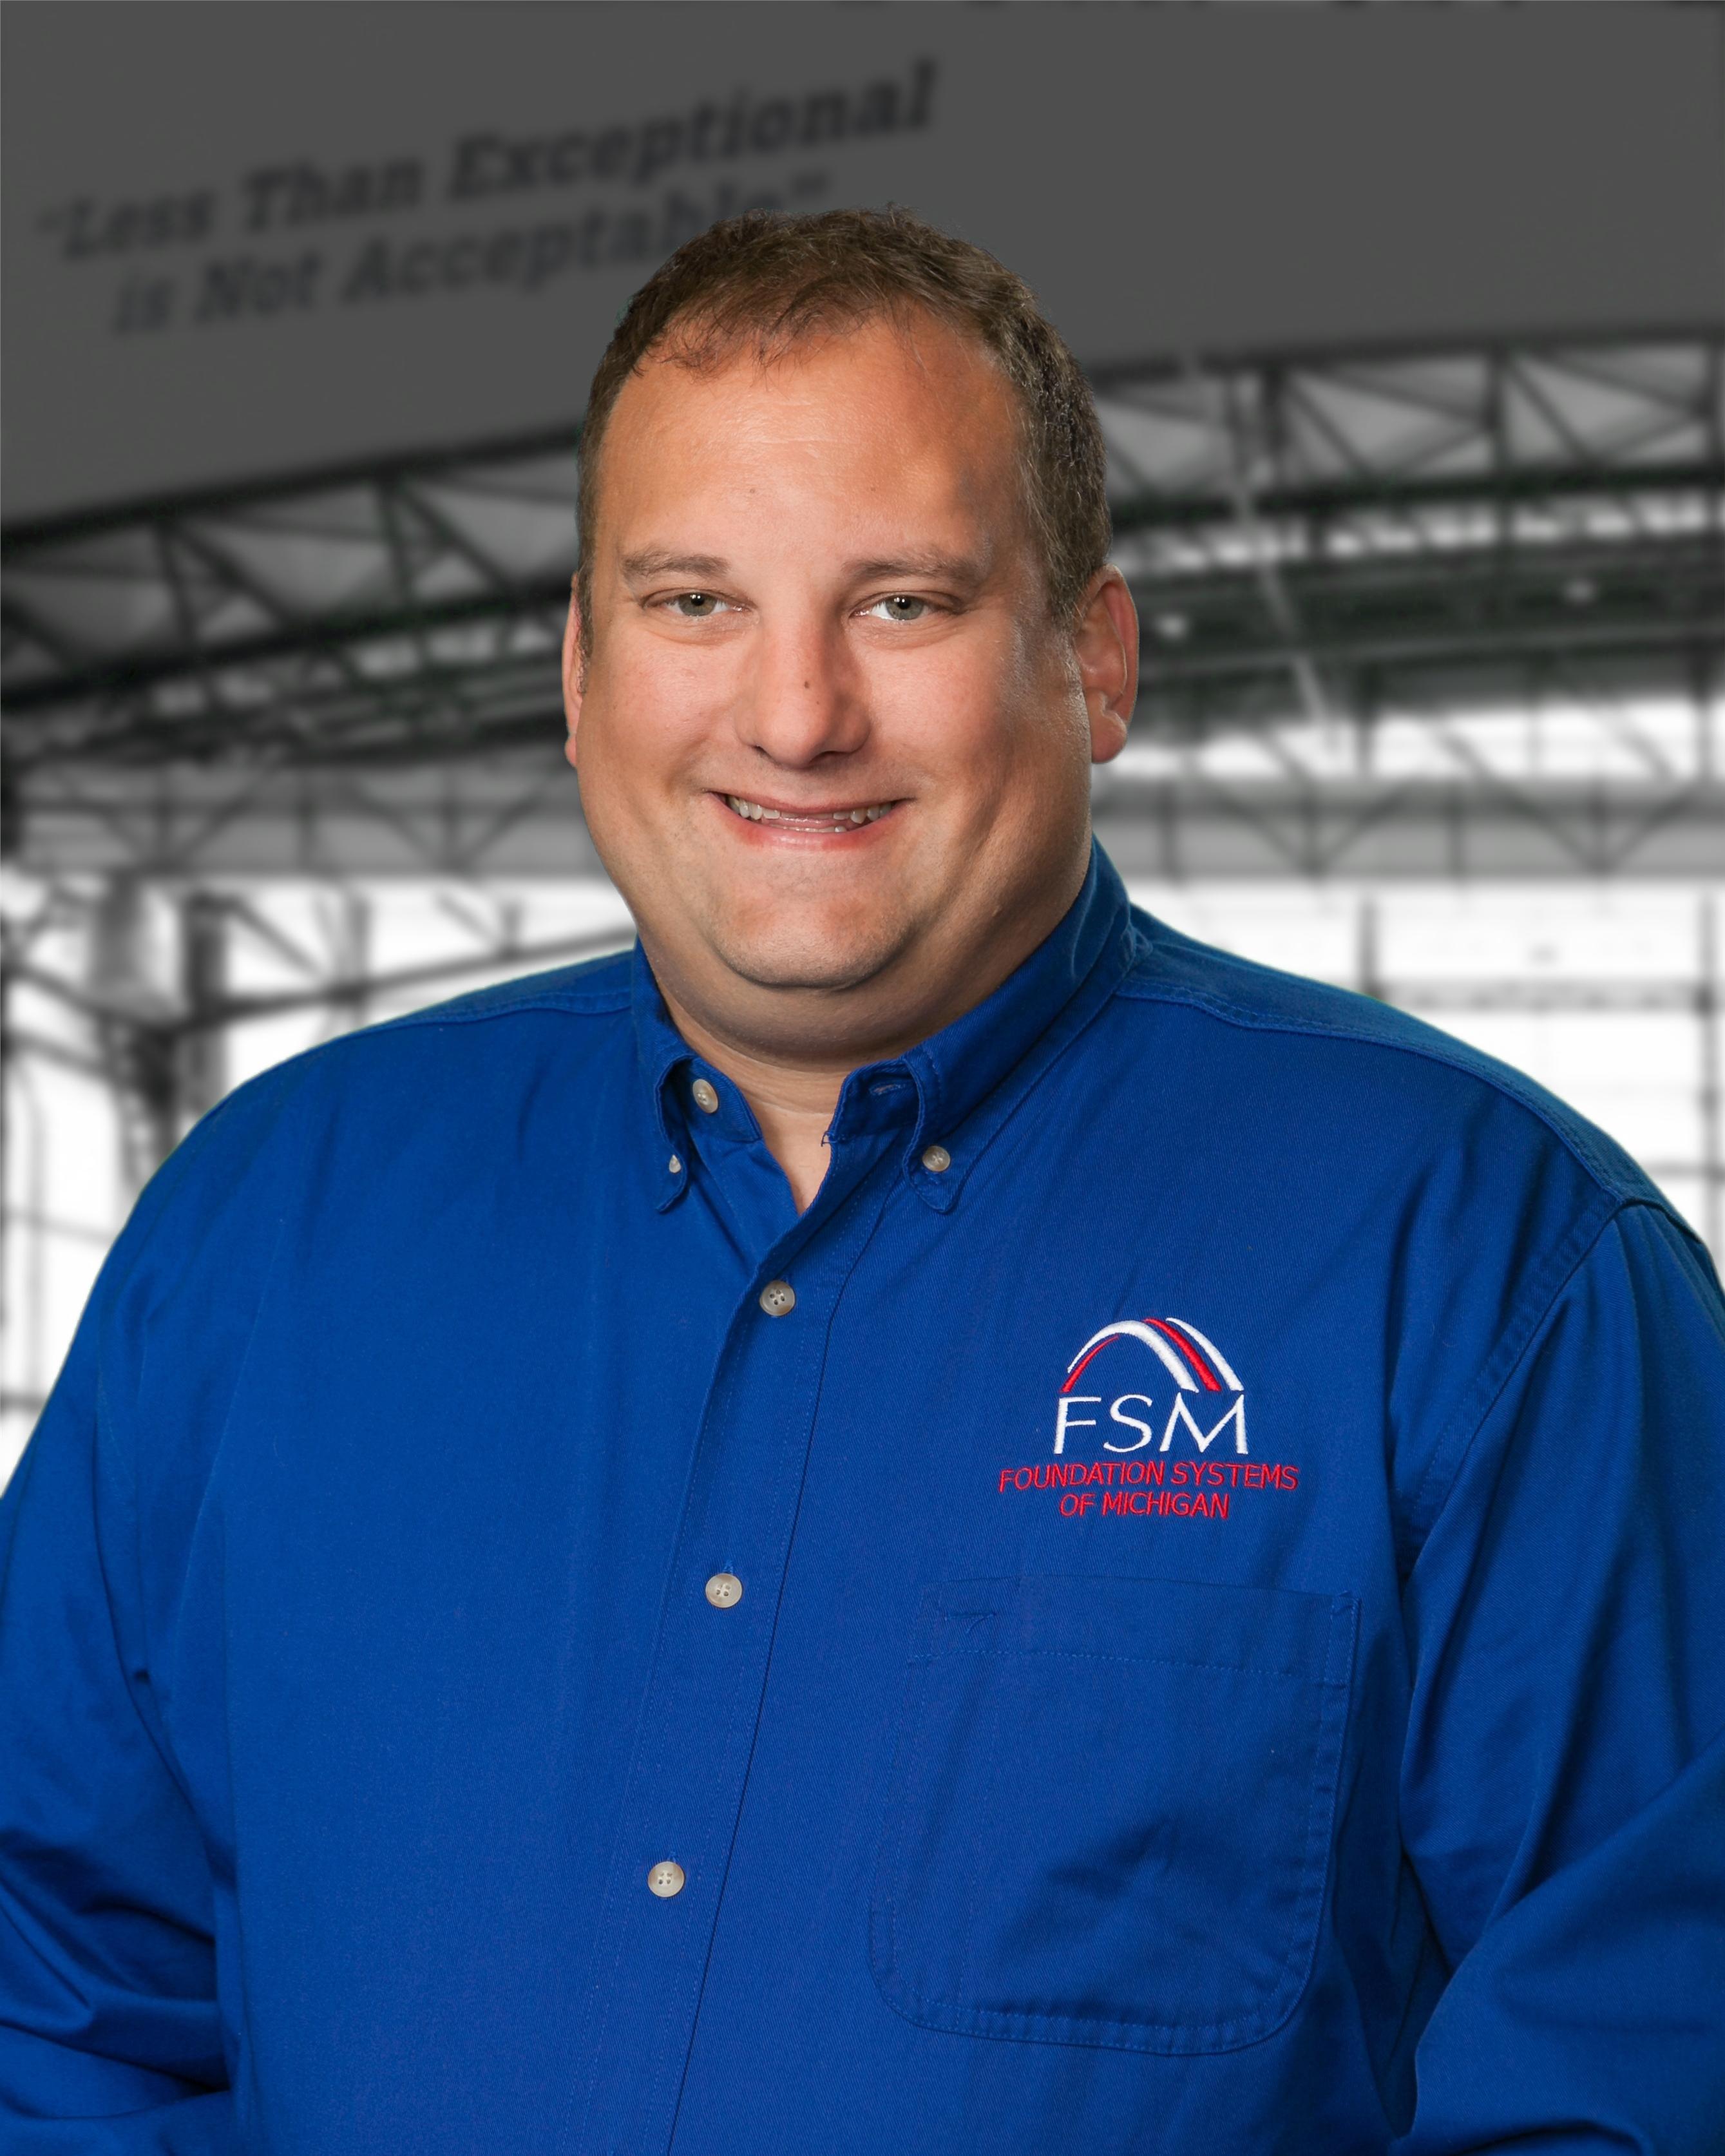 FSM Mike Letvin Service Coordinator